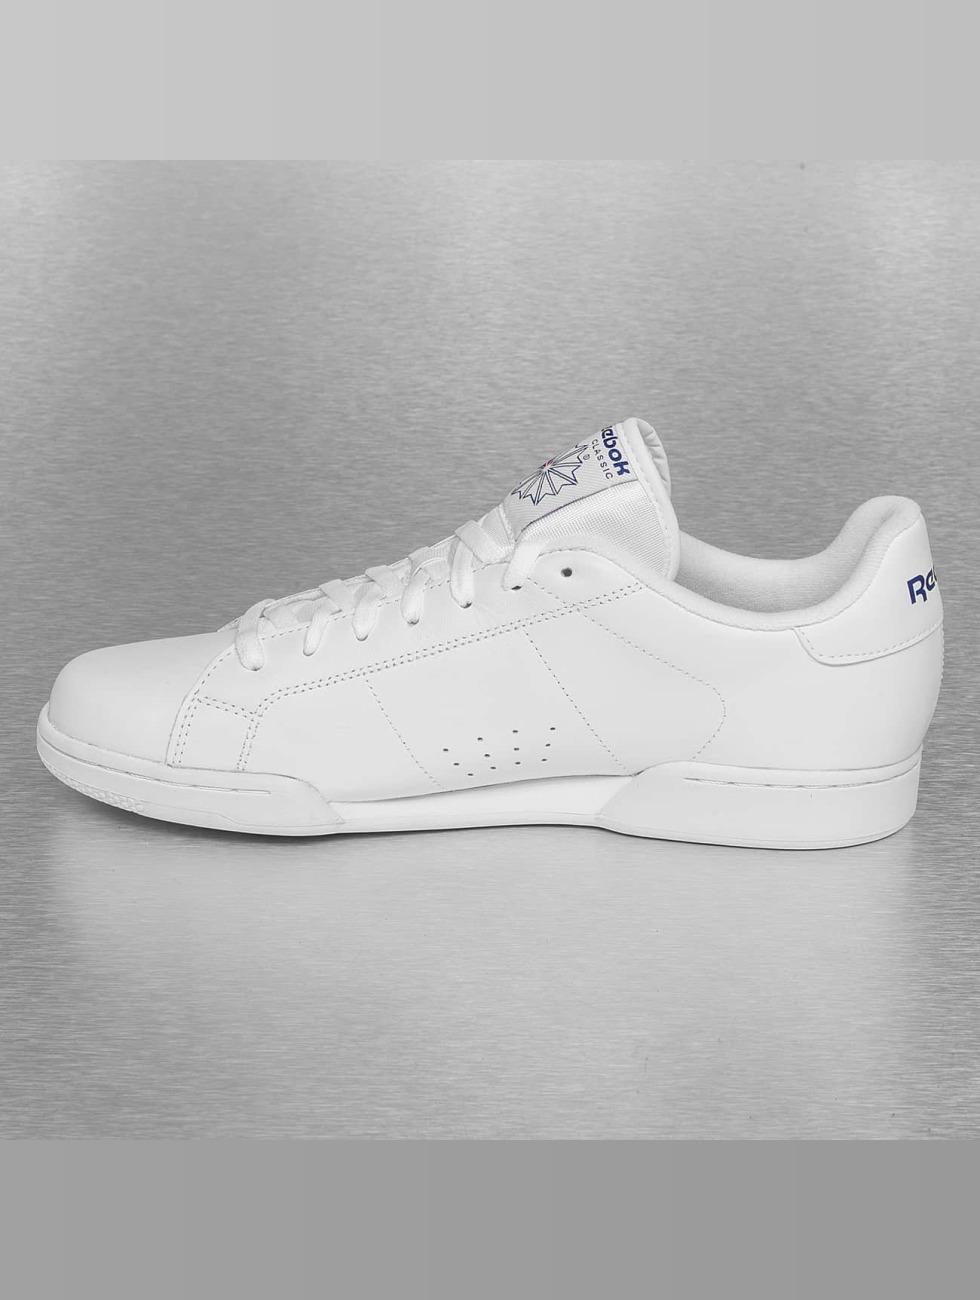 Roebuck Pattino / Sneaker Ii Npc In Bianco 131.367 LhzDv